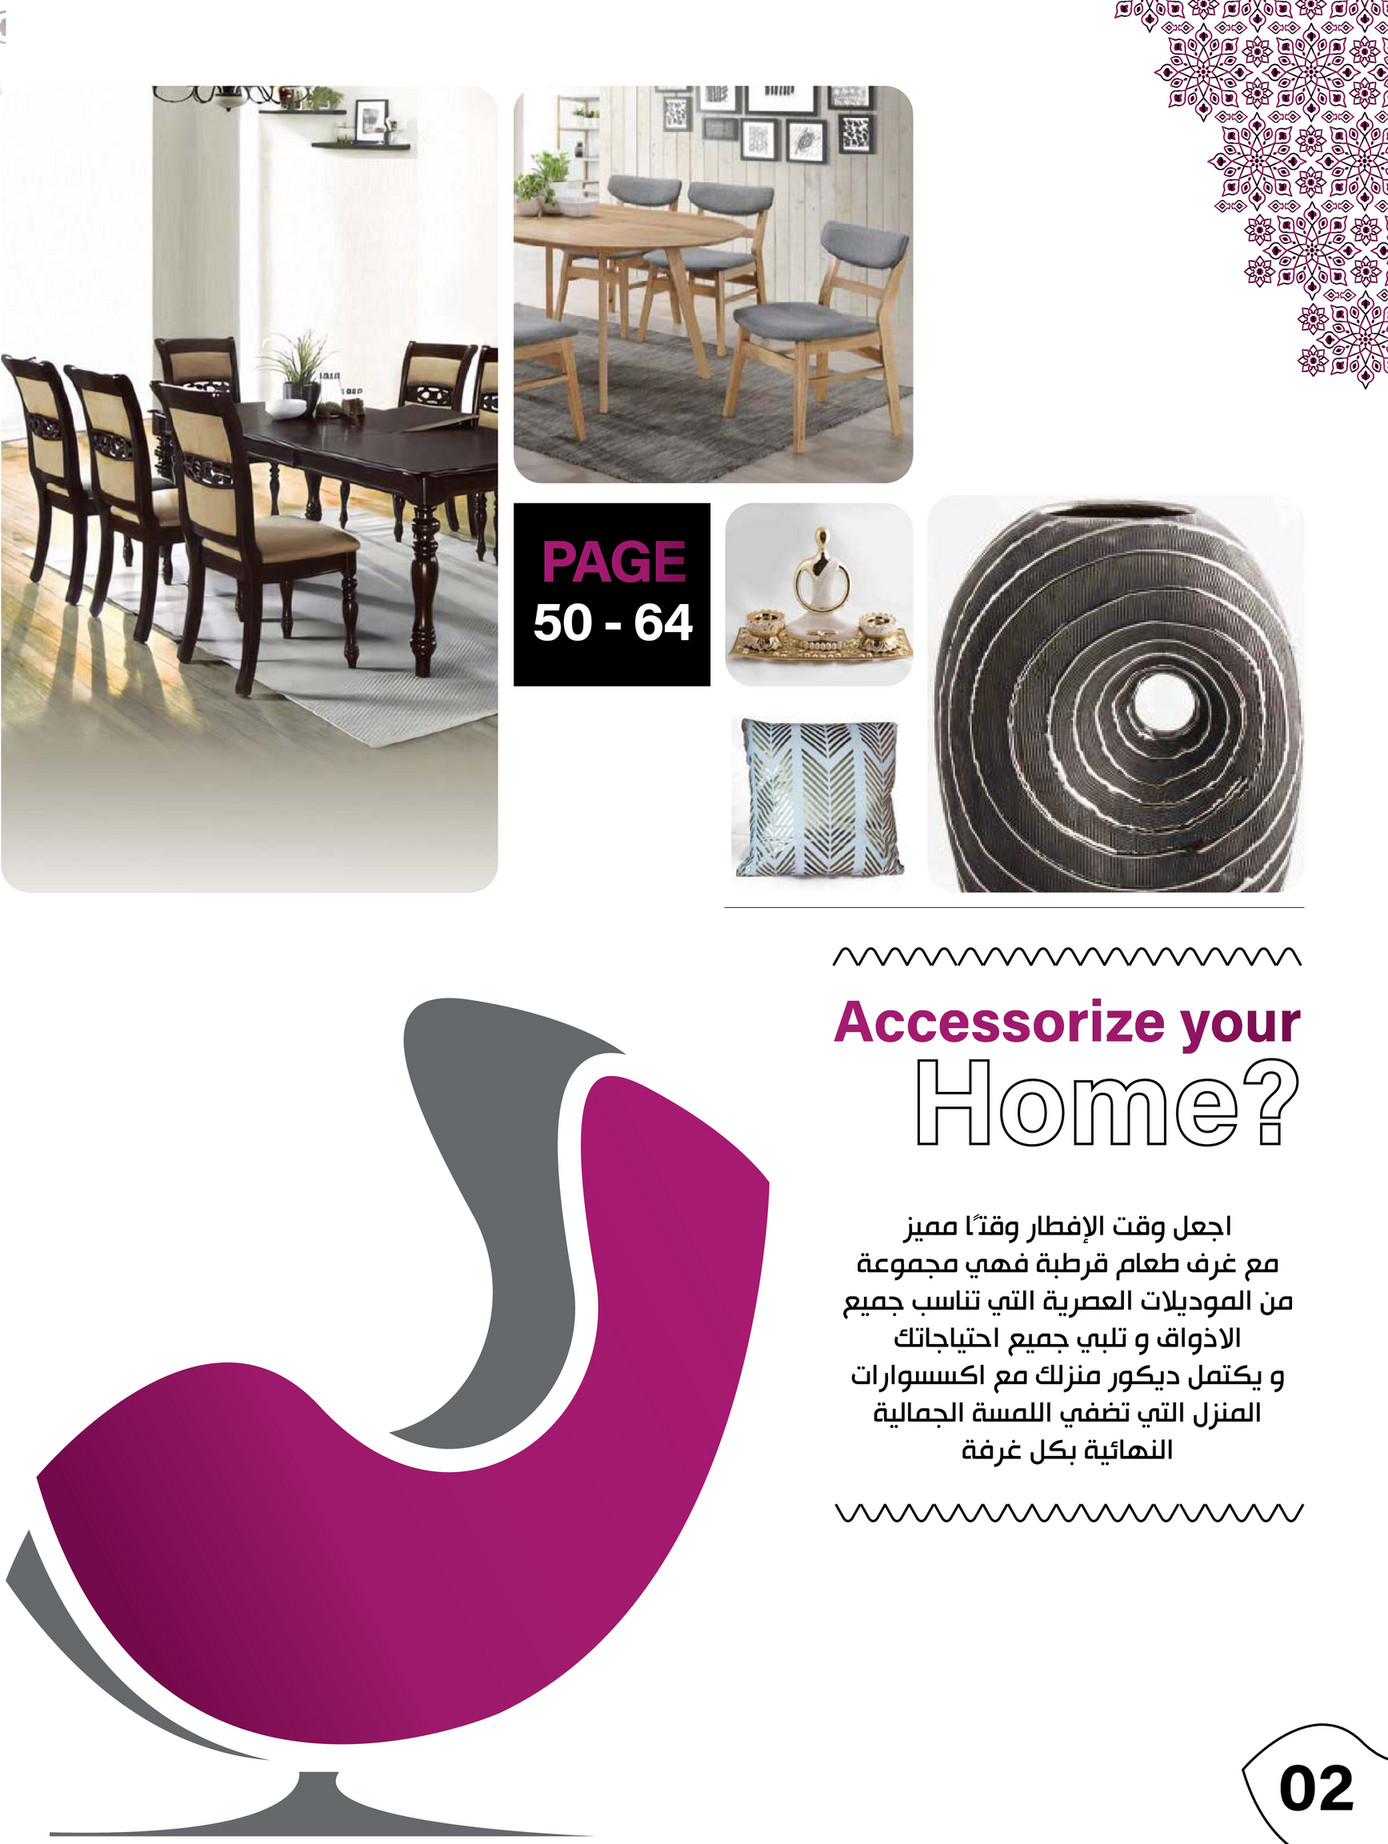 At home furniture Ramadan brouchure qurtoba furniture Page 1